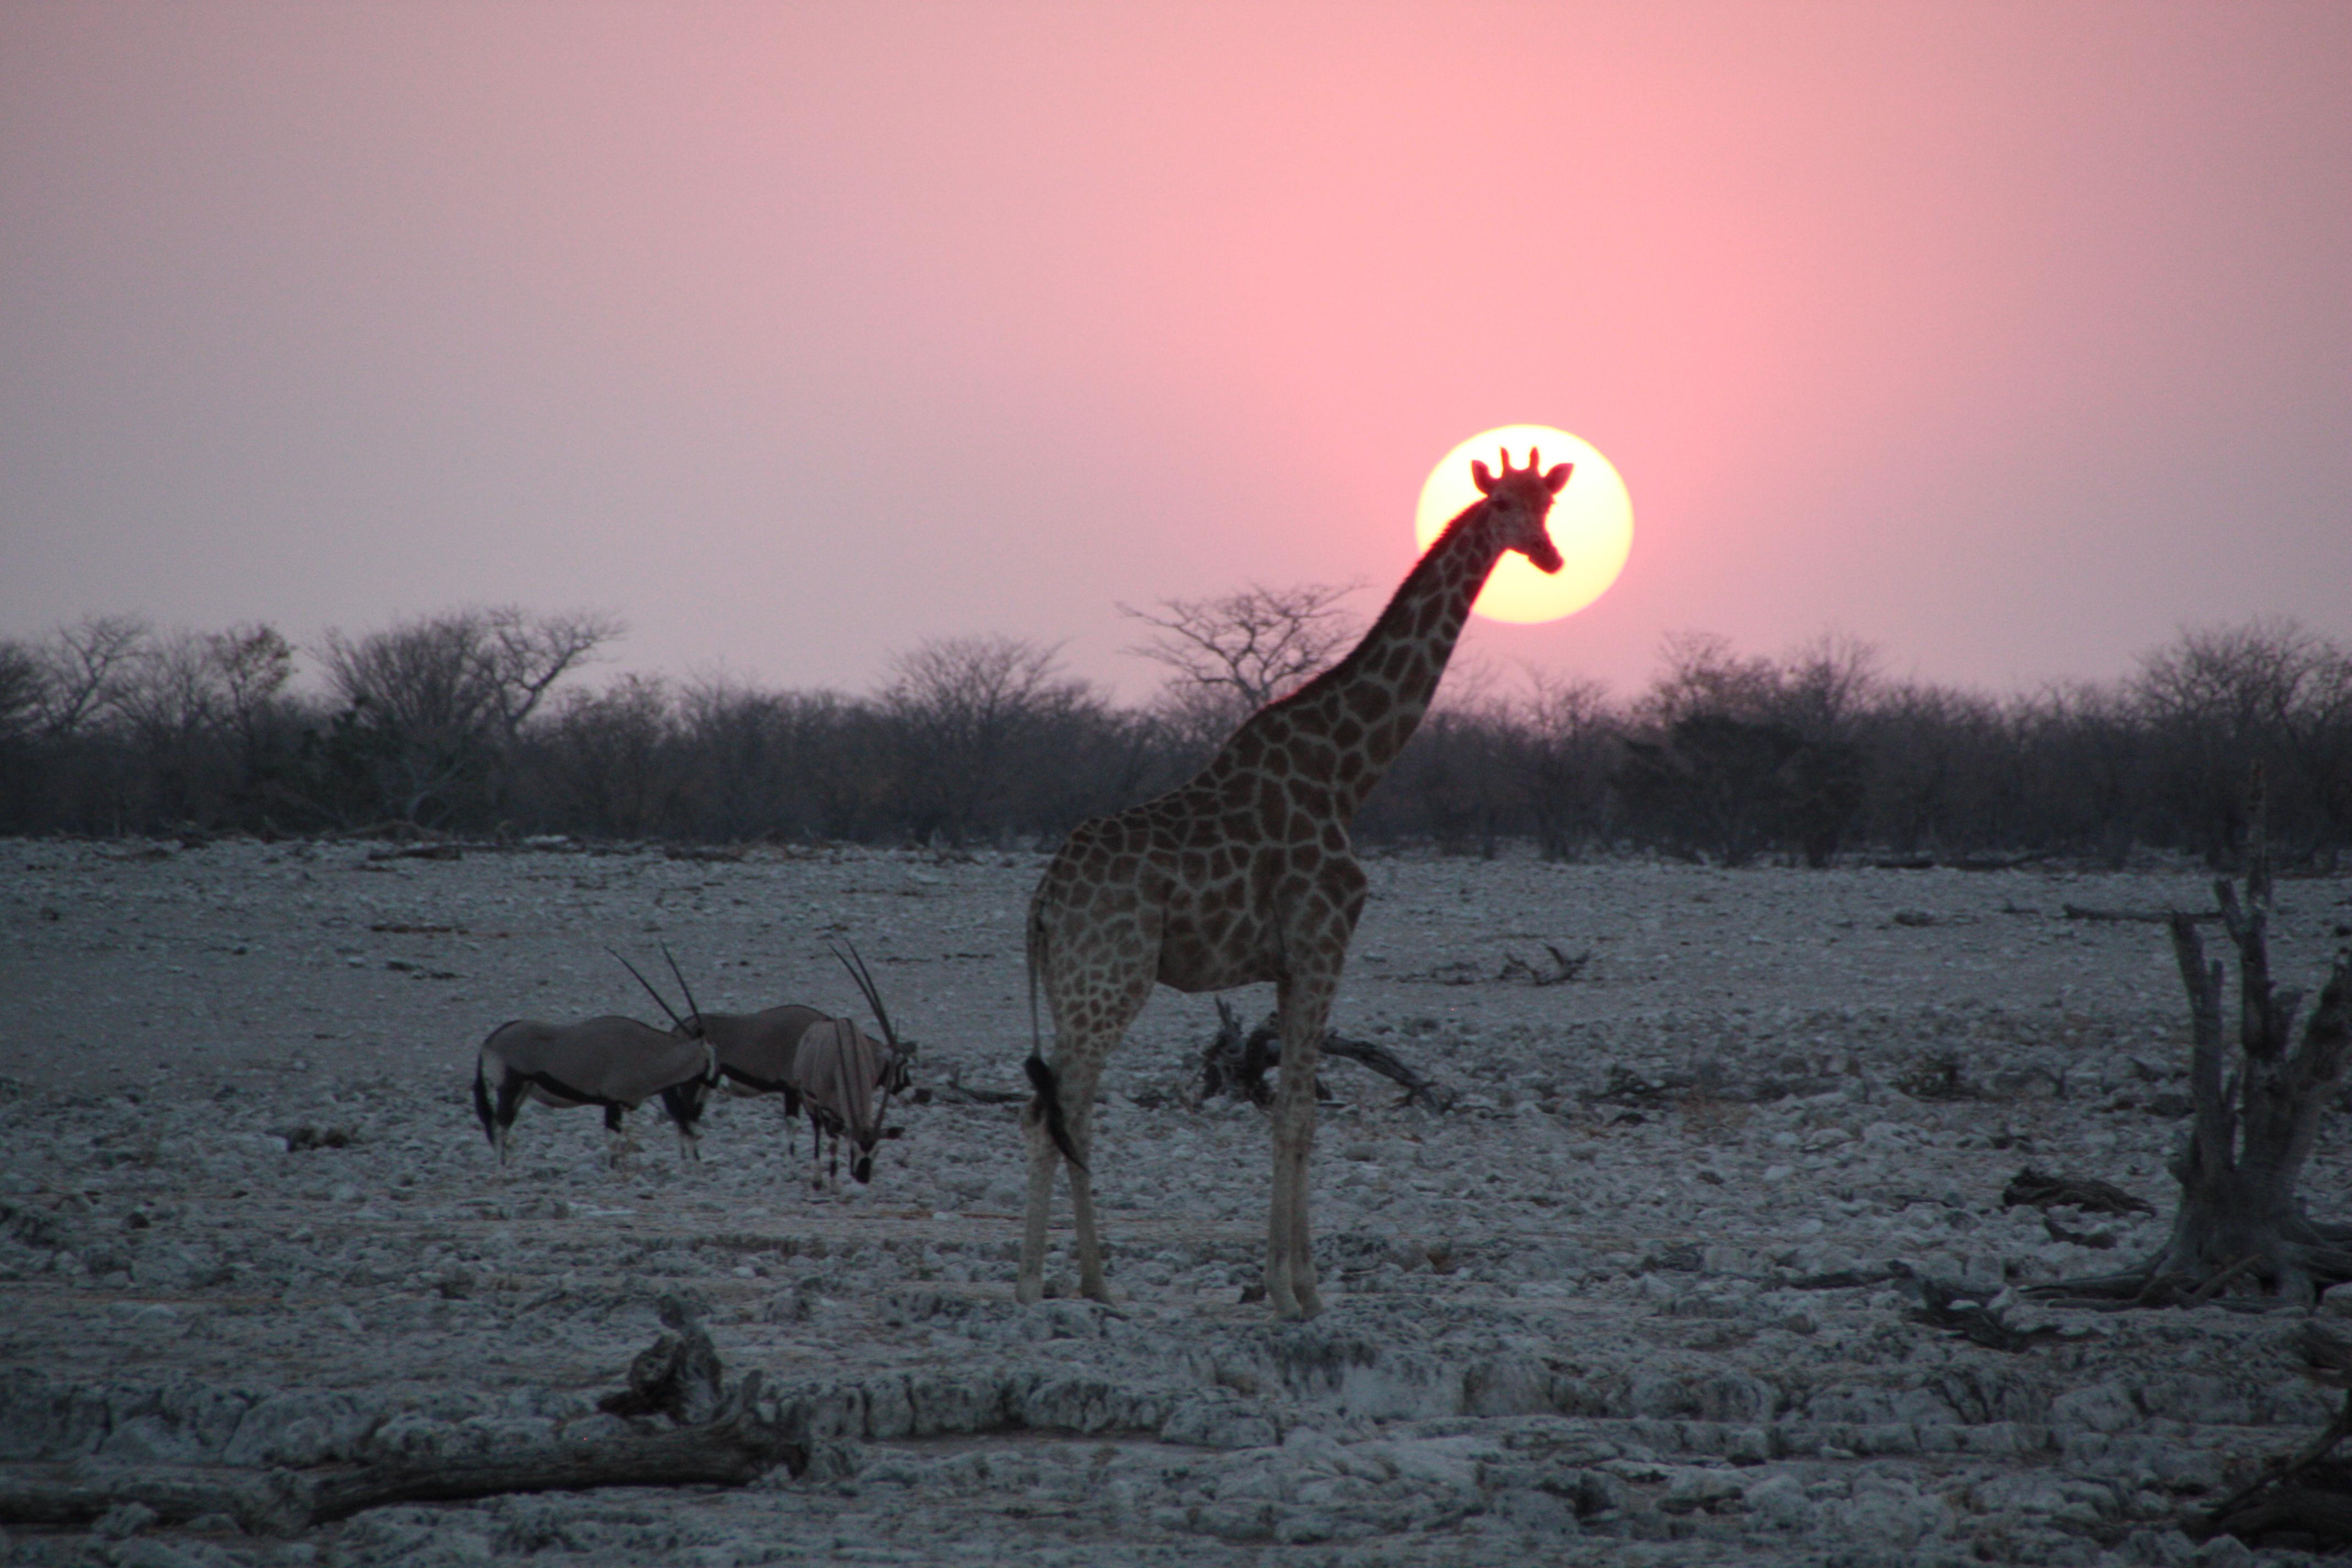 Giraffe und Oryx-Antilopen beim Sonnenuntergang im Etosha-Nationalpark, Namibia